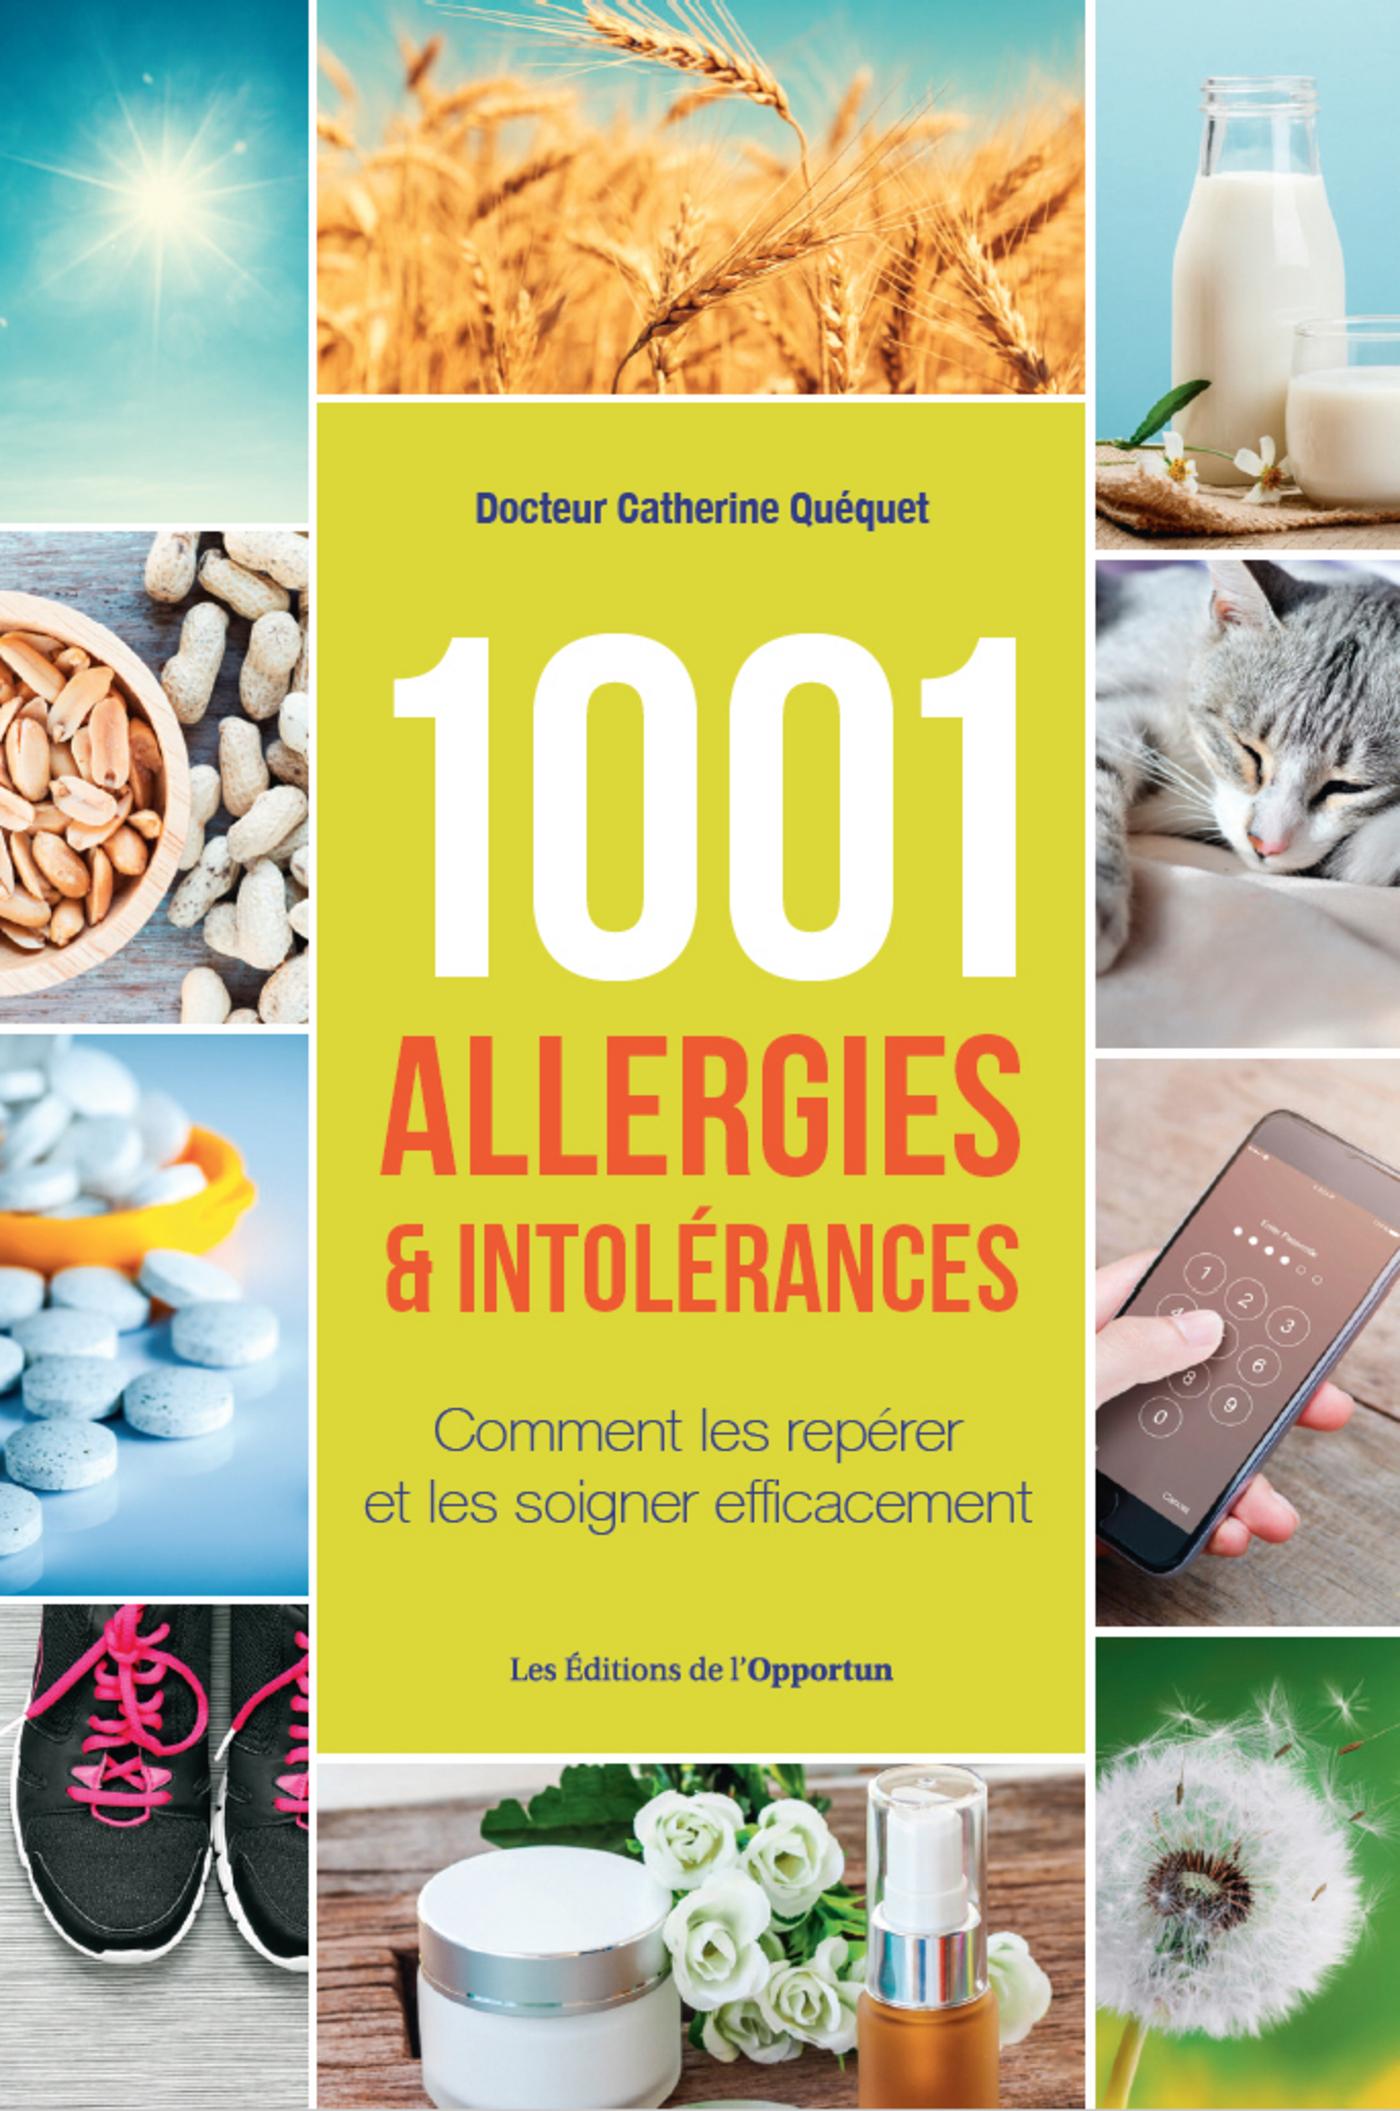 1001 Allergies & Intol?rances